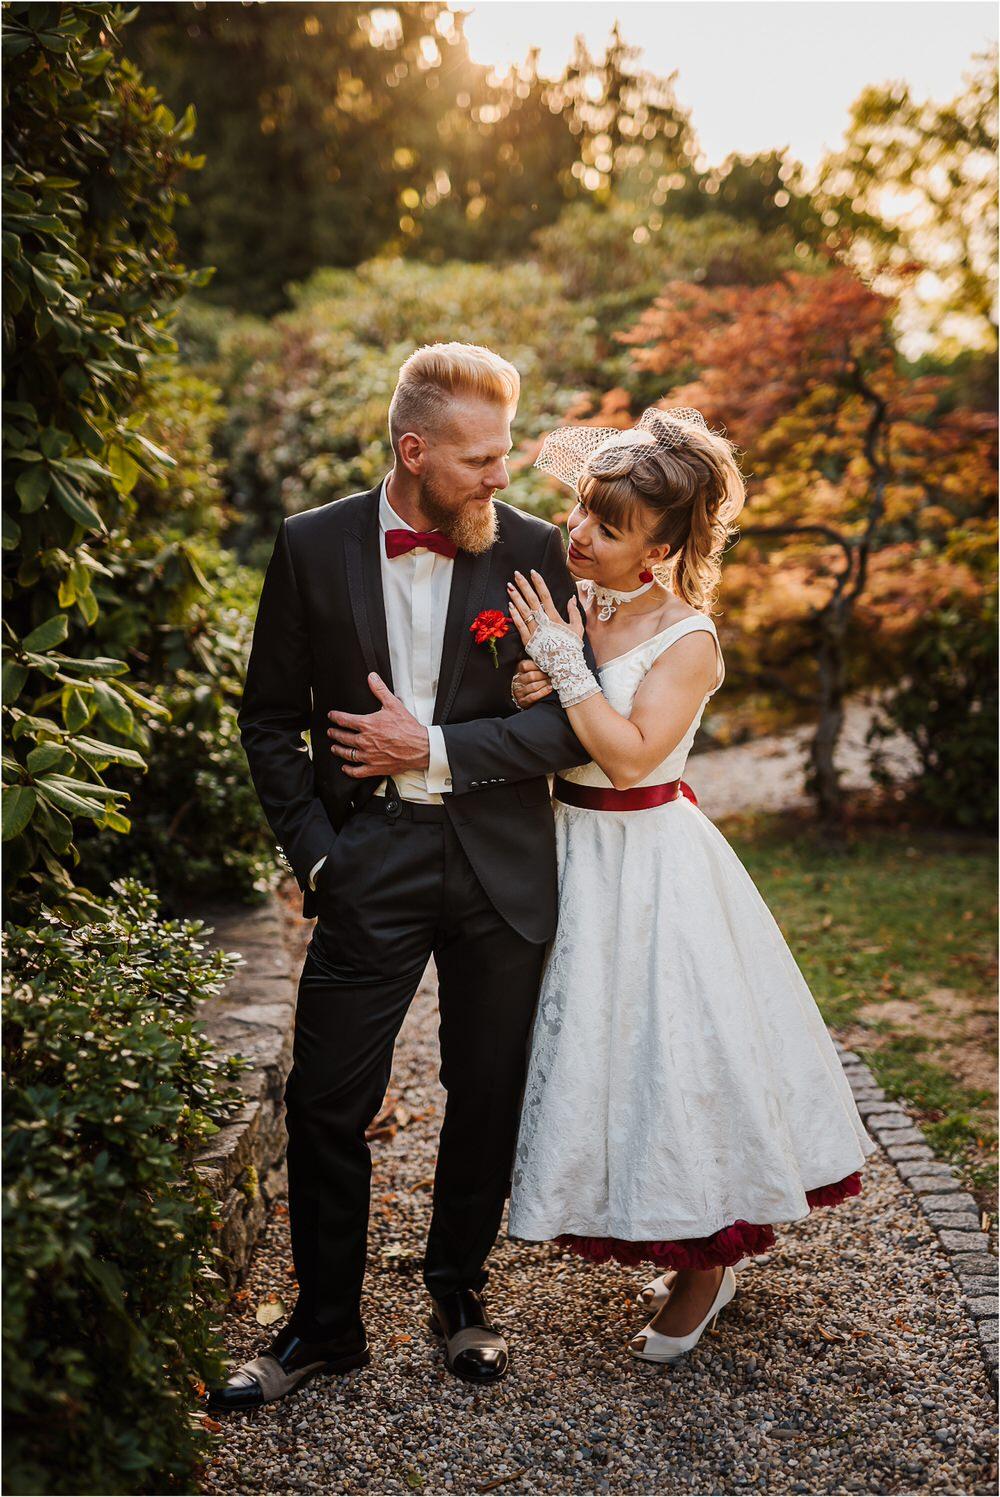 evian france wedding photographer photographer hotel royale rockabilly wedding poroka tematska nika grega themed wedding 0071.jpg